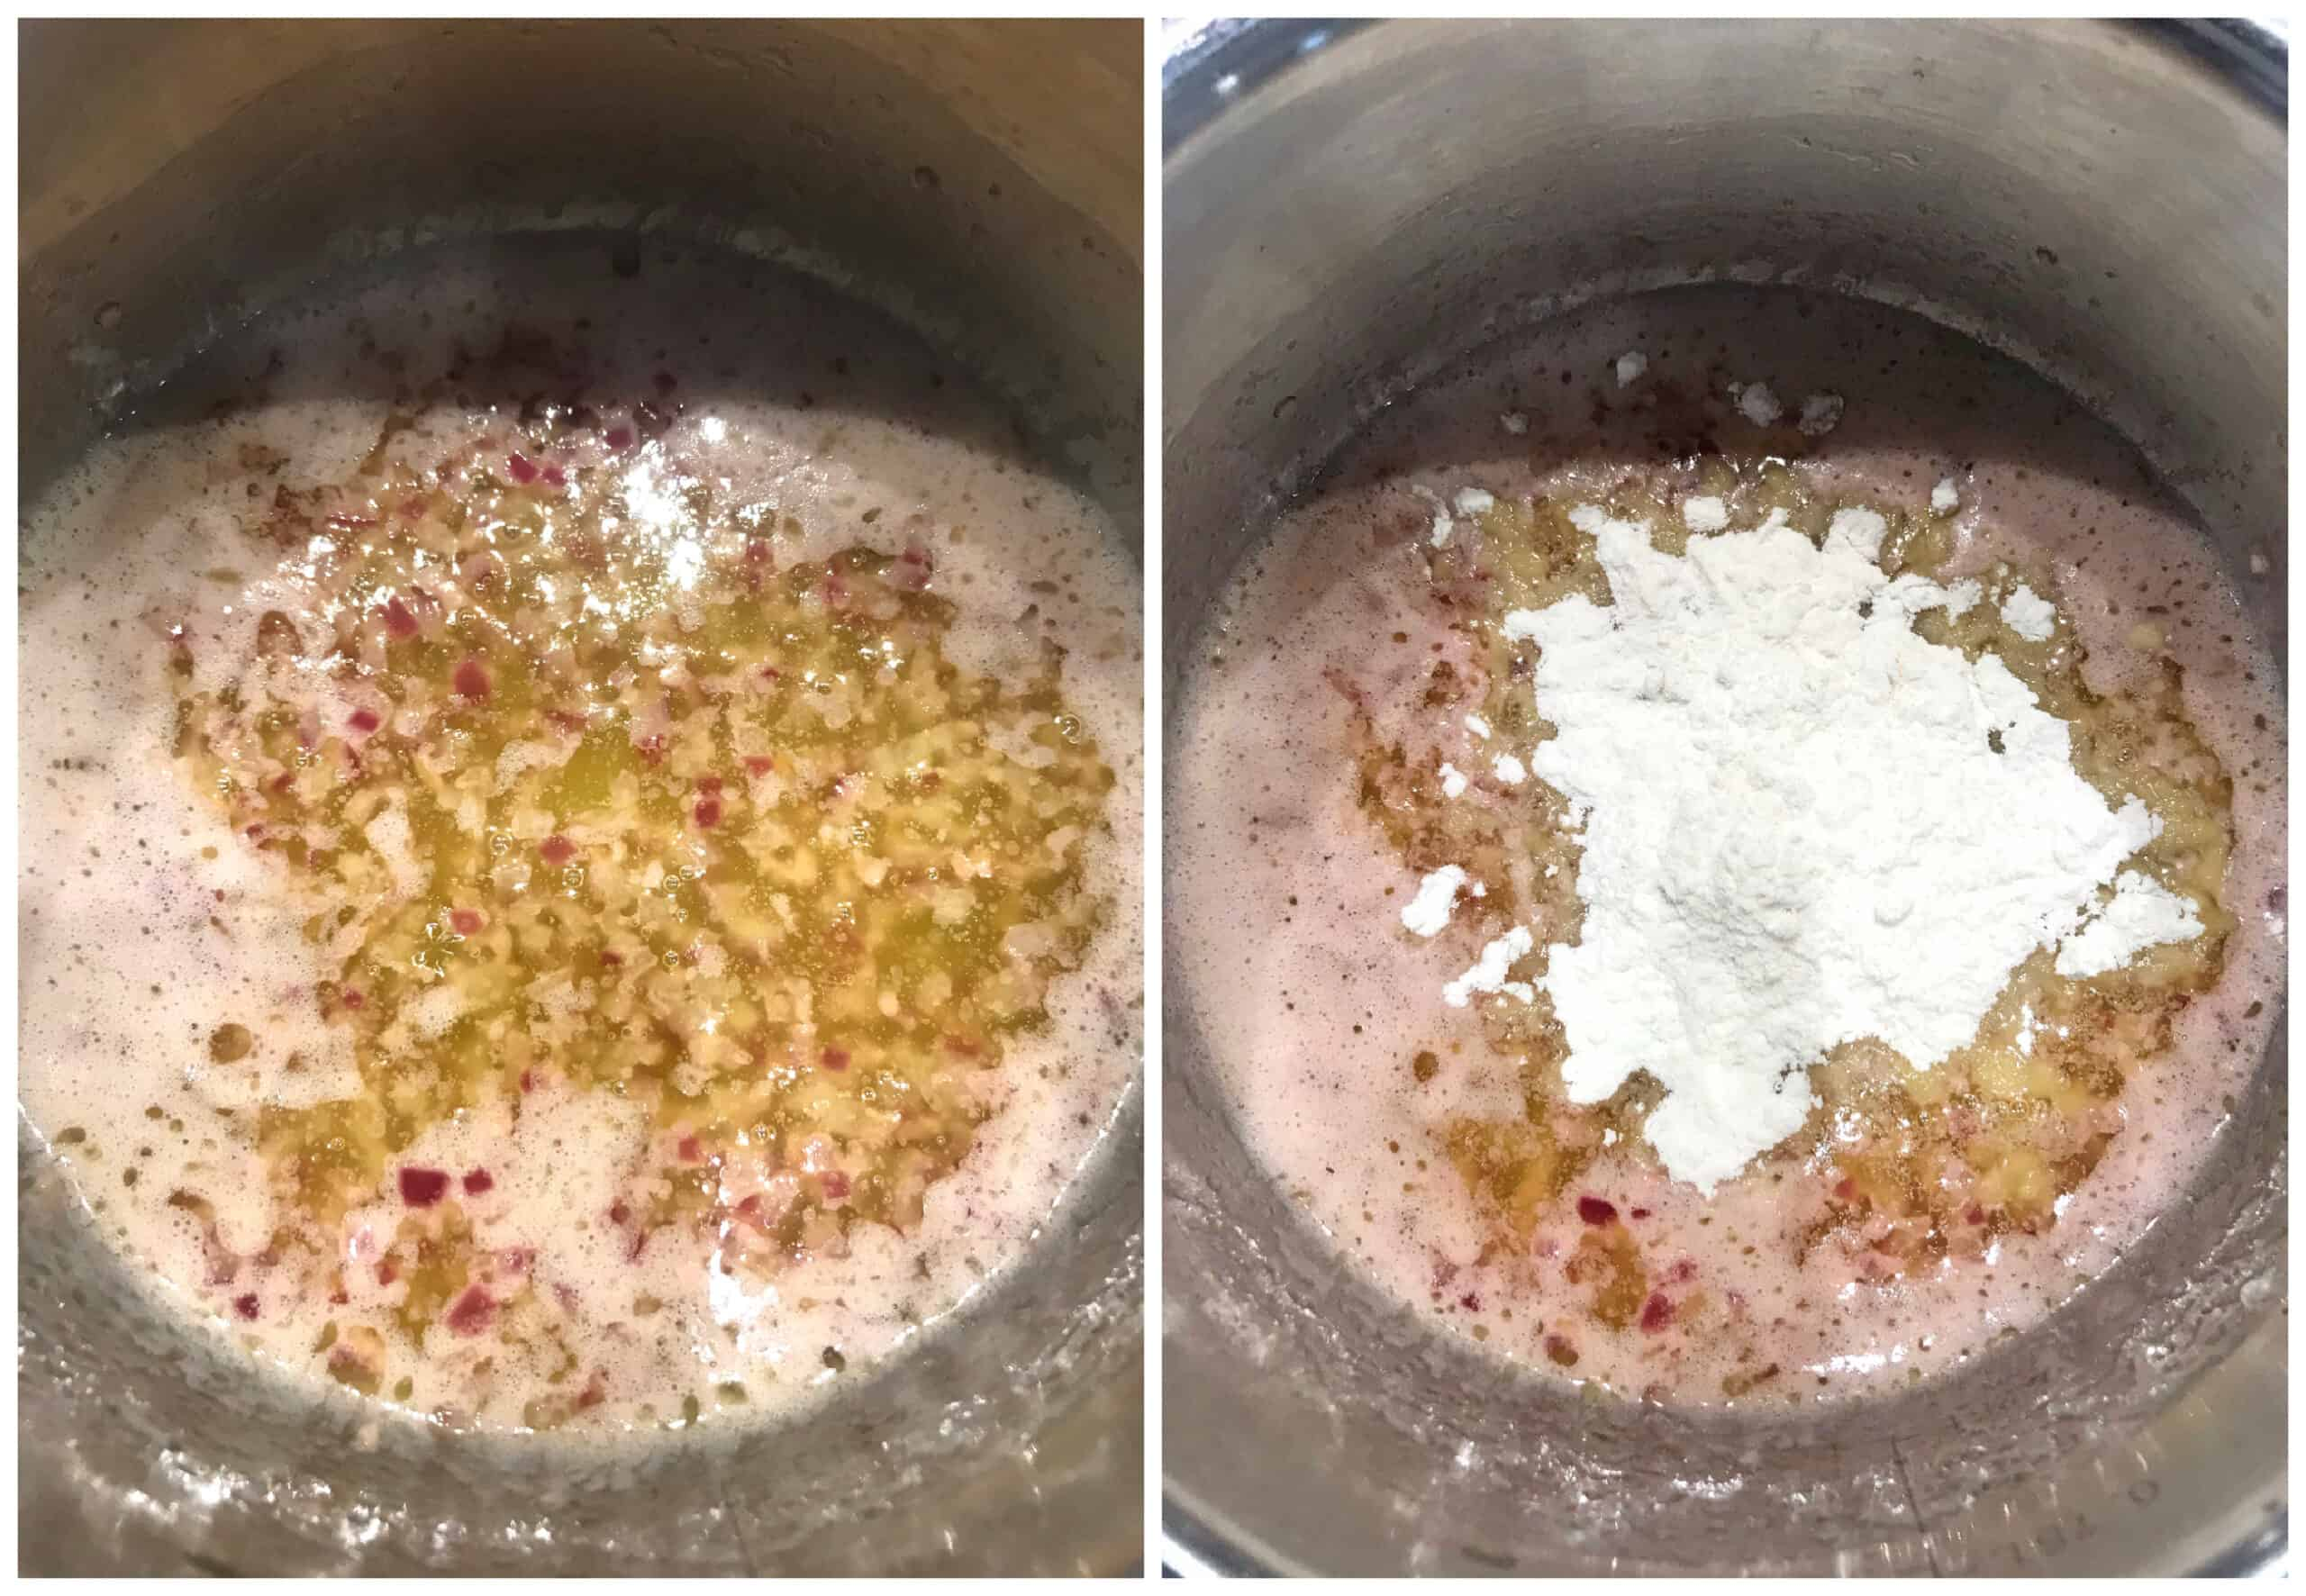 simmering ingredients in saucepan with flour